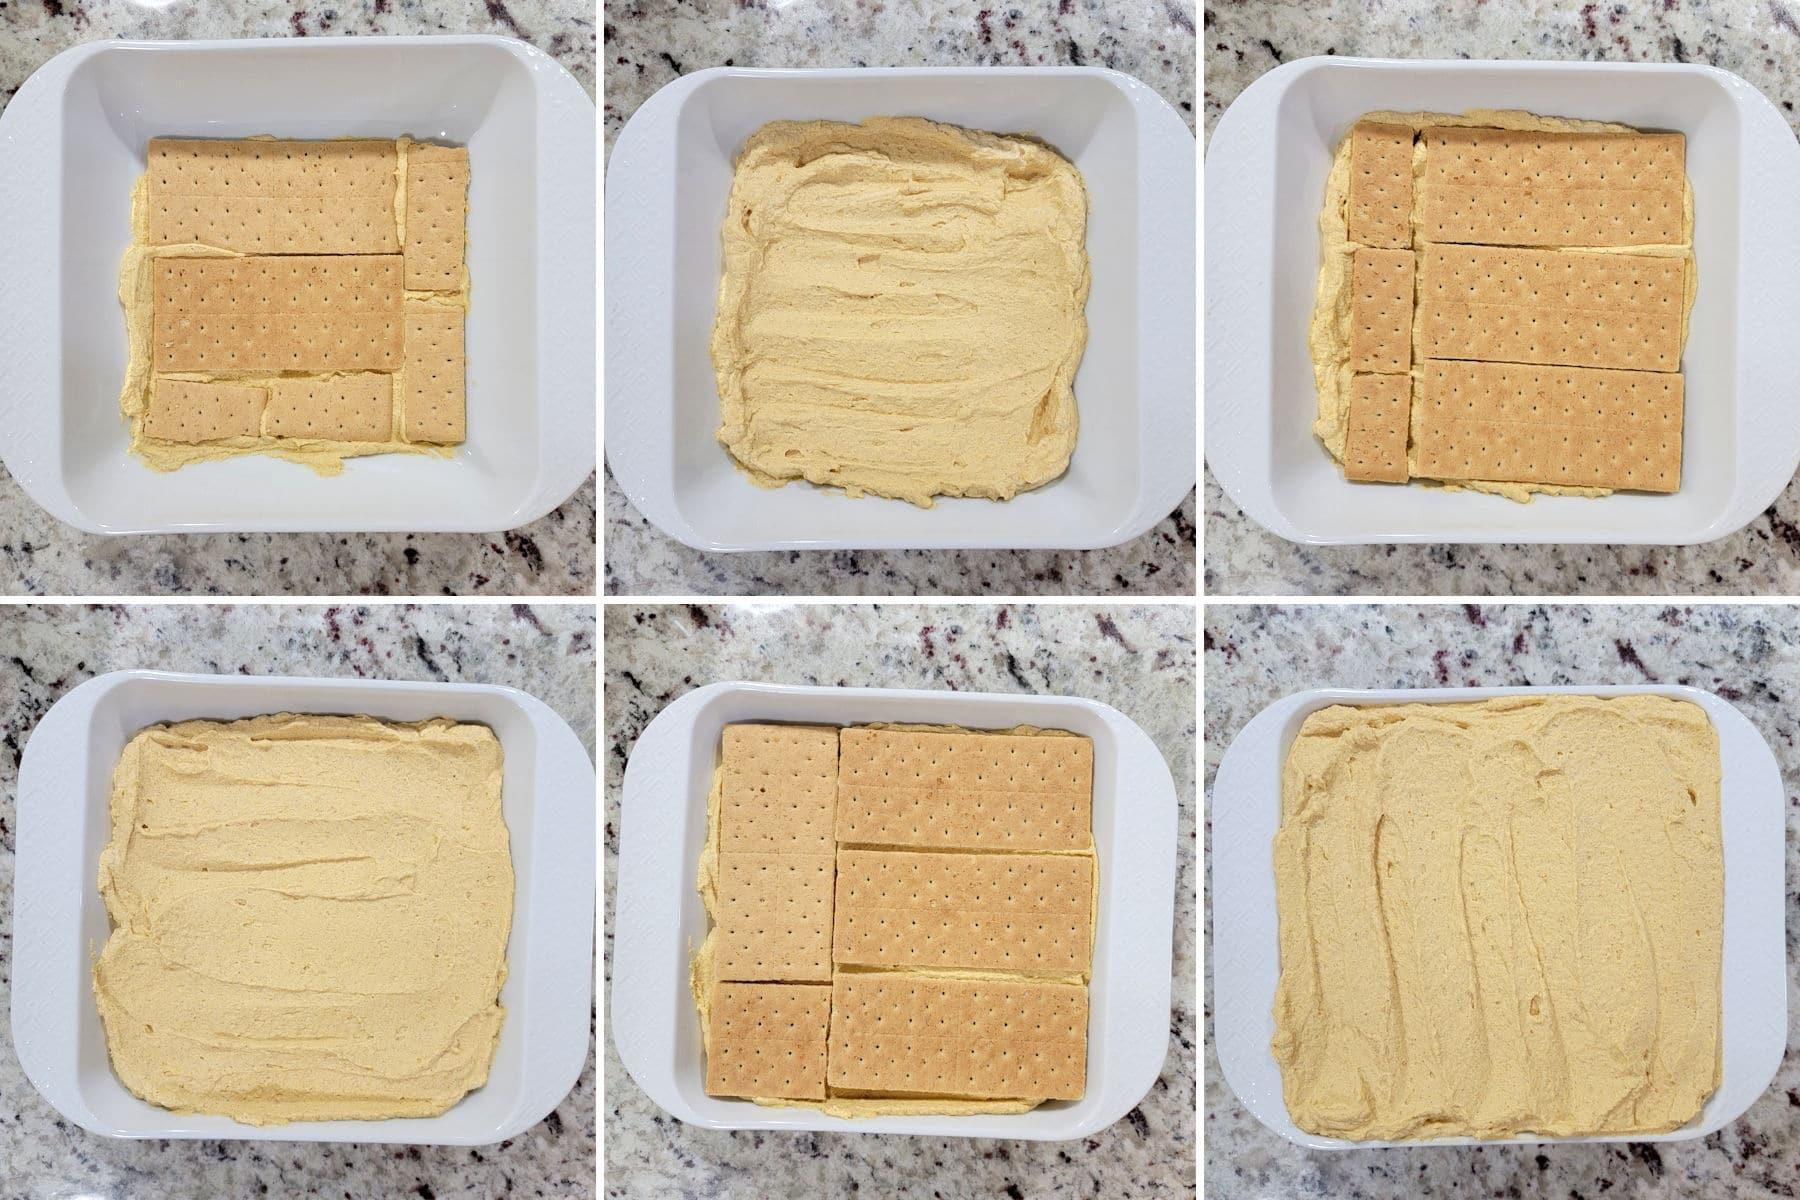 Assembling layers of a pumpkin icebox cake.